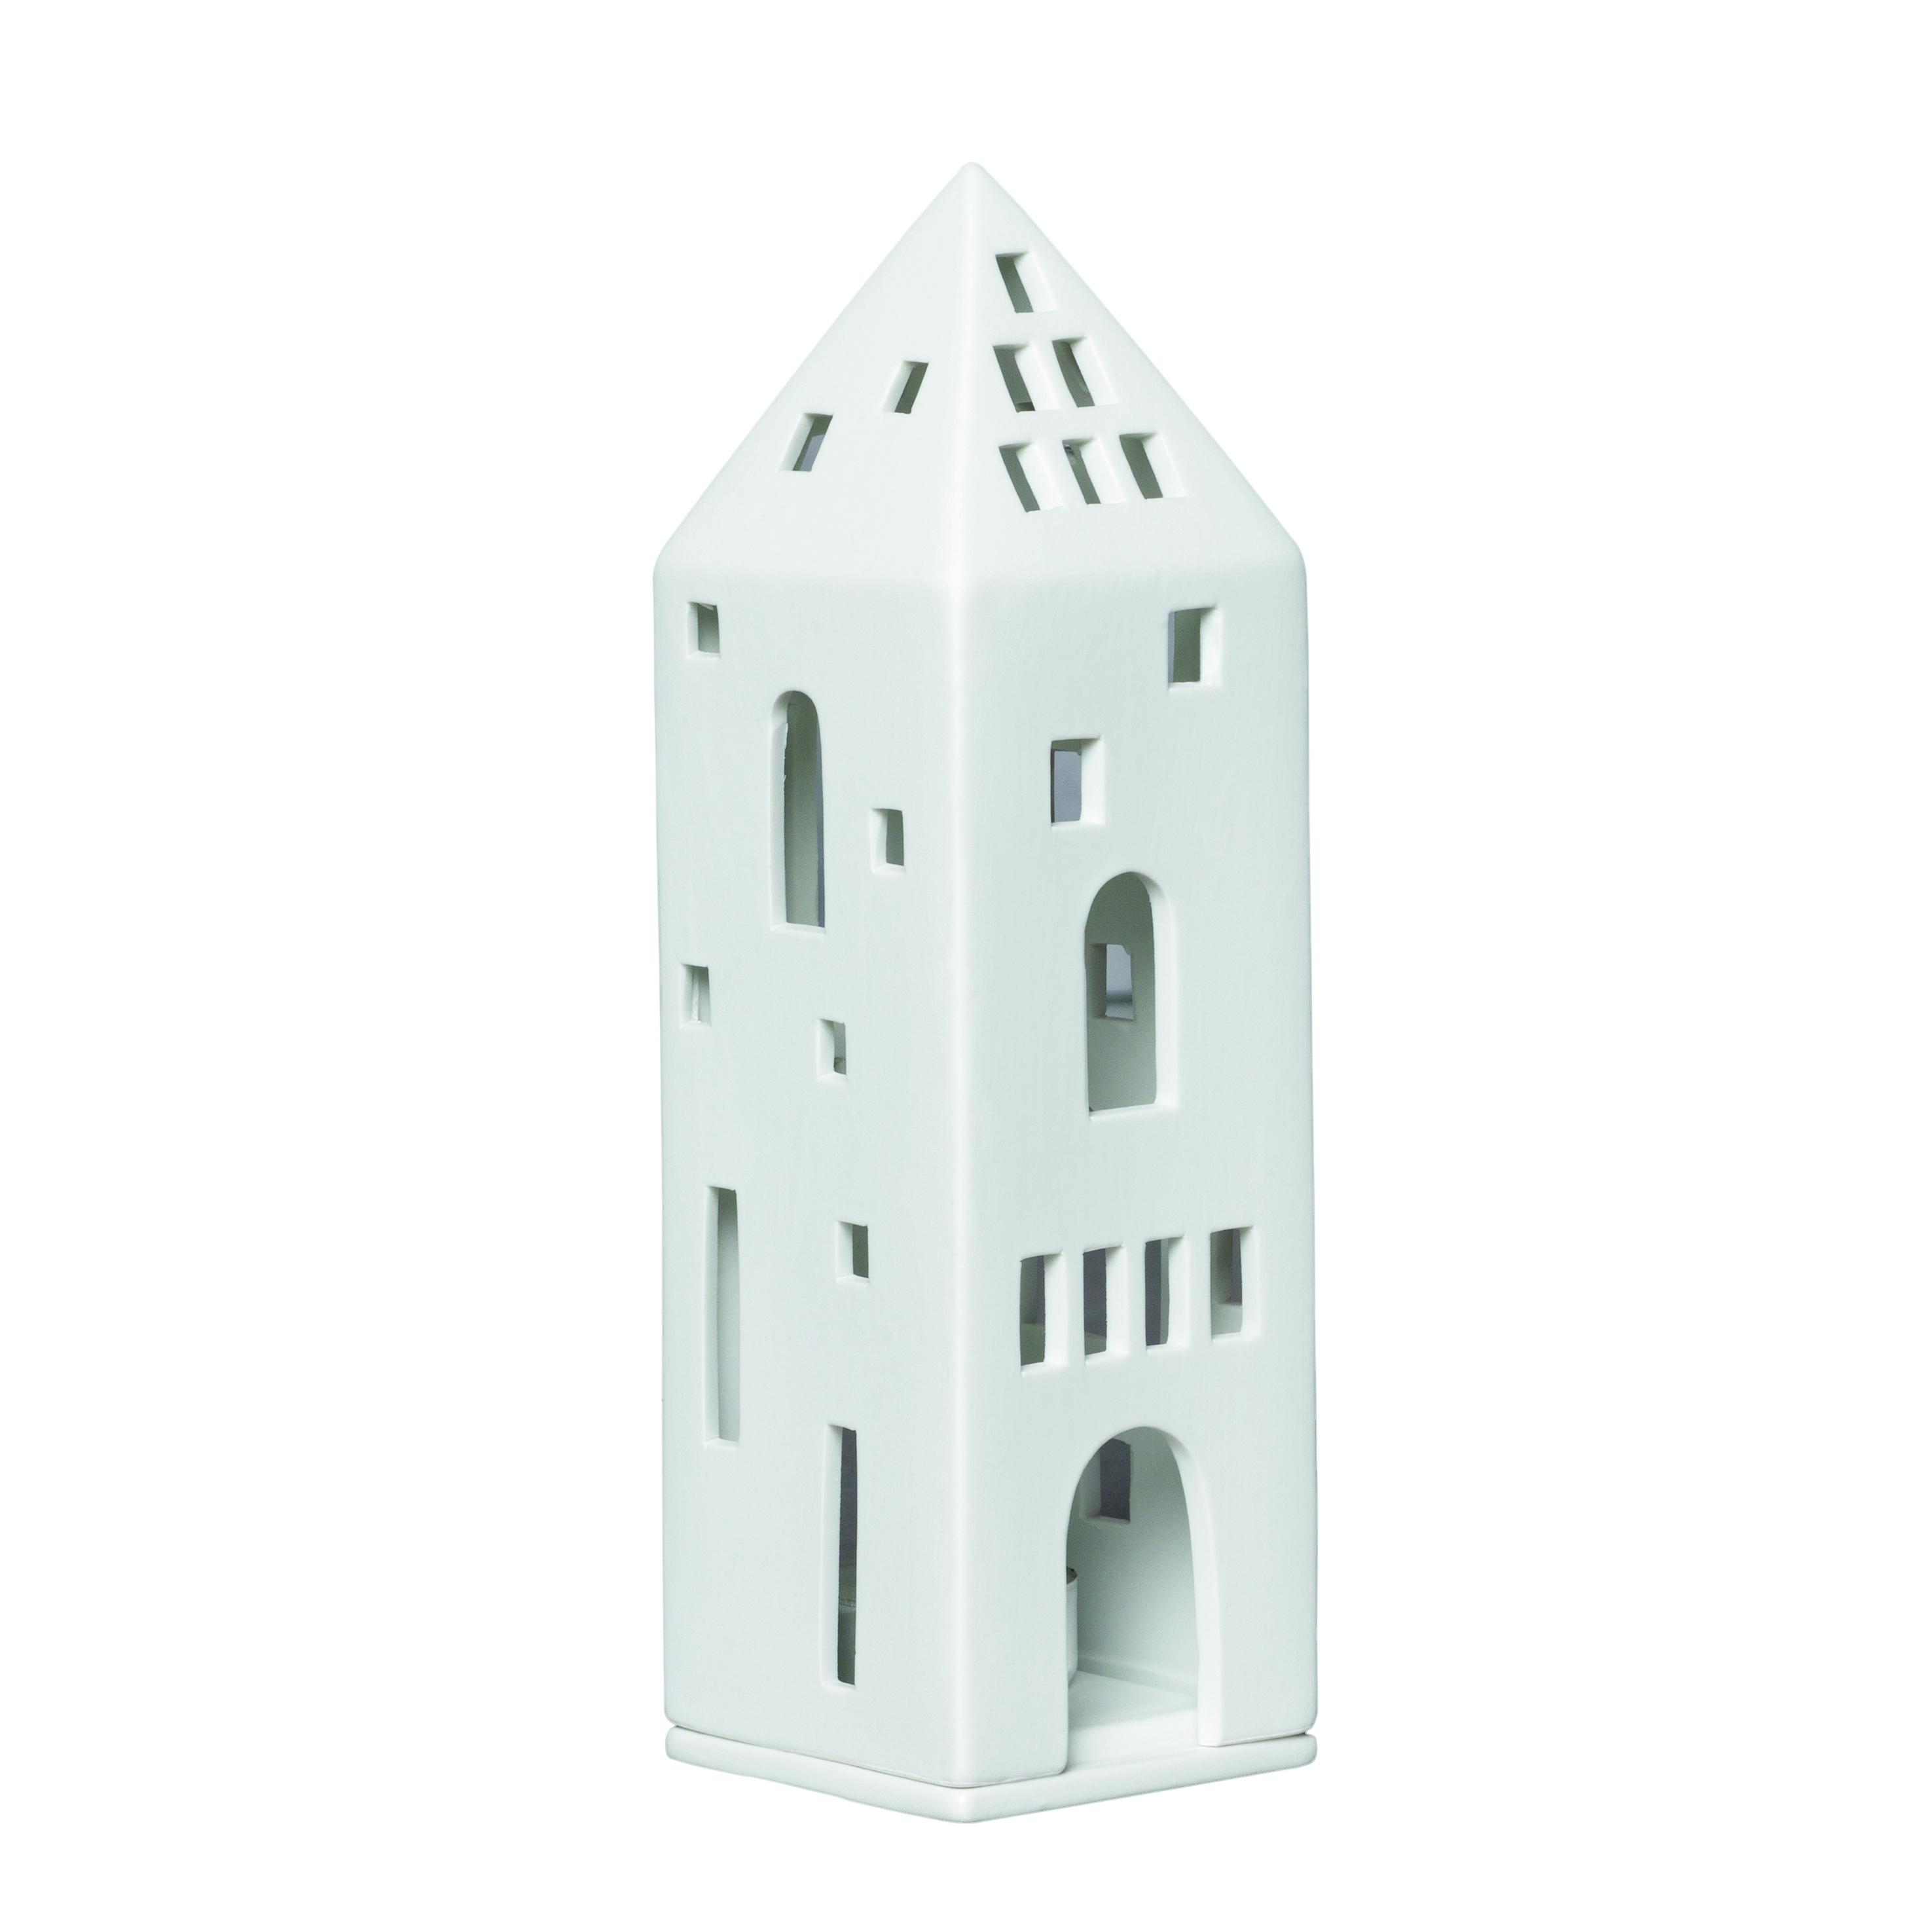 "Lichthaus ""Turm"" - räder"